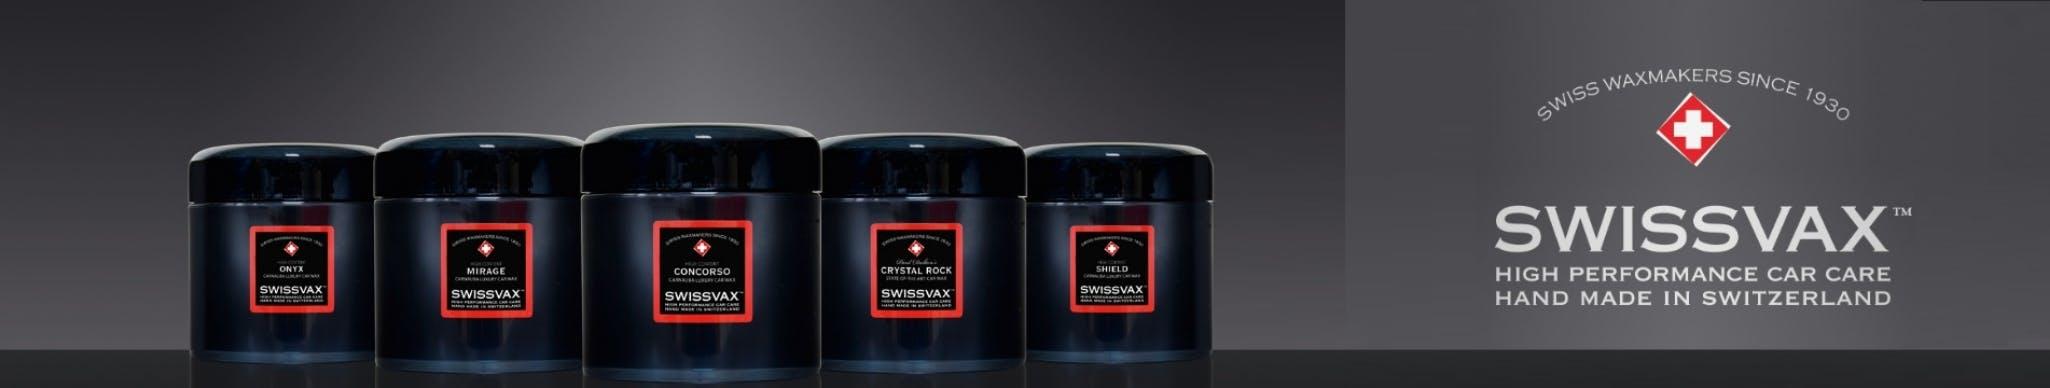 SWISSVAX Landingpage